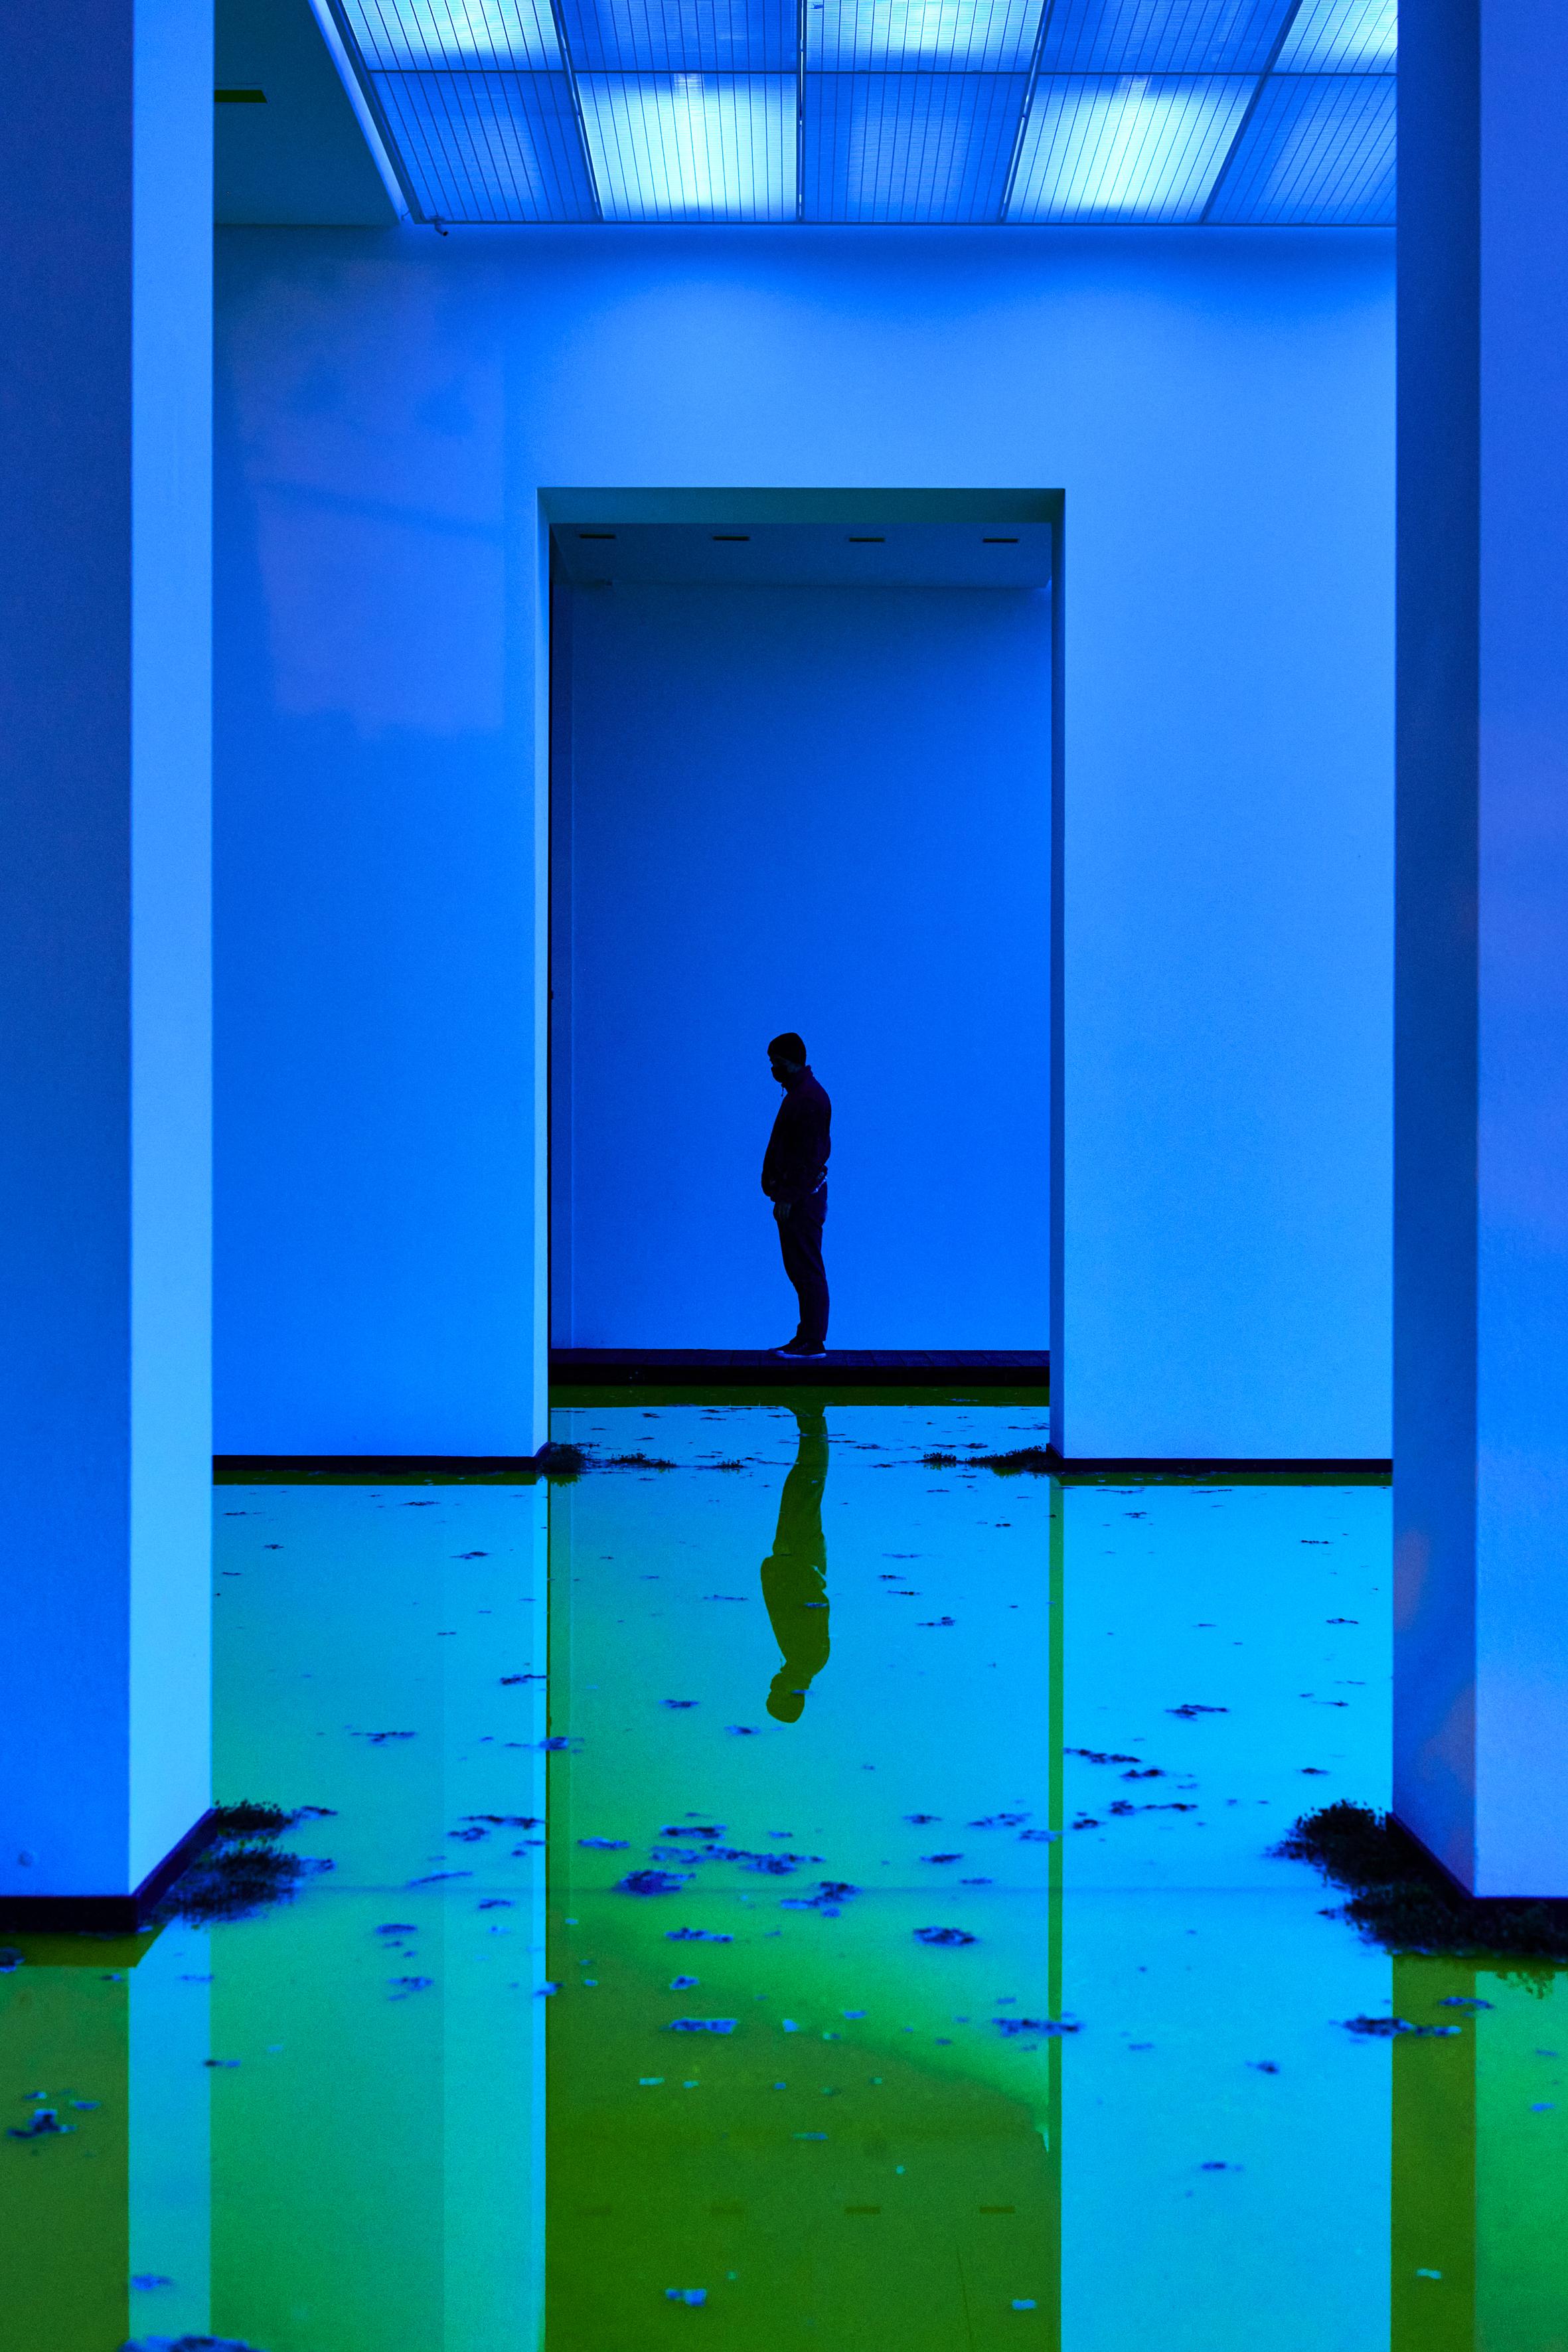 Olafur Eliasson, Life, 2021. Installation view: Fondation Beyeler, Riehen/Basel, 2021. Courtesy of the artist; neugerriemschneider, Berlin; Tanya Bonakdar Gallery, New York / Los Angeles. © 2021 Olafur Eliasson. Photo: Mark Niedermann